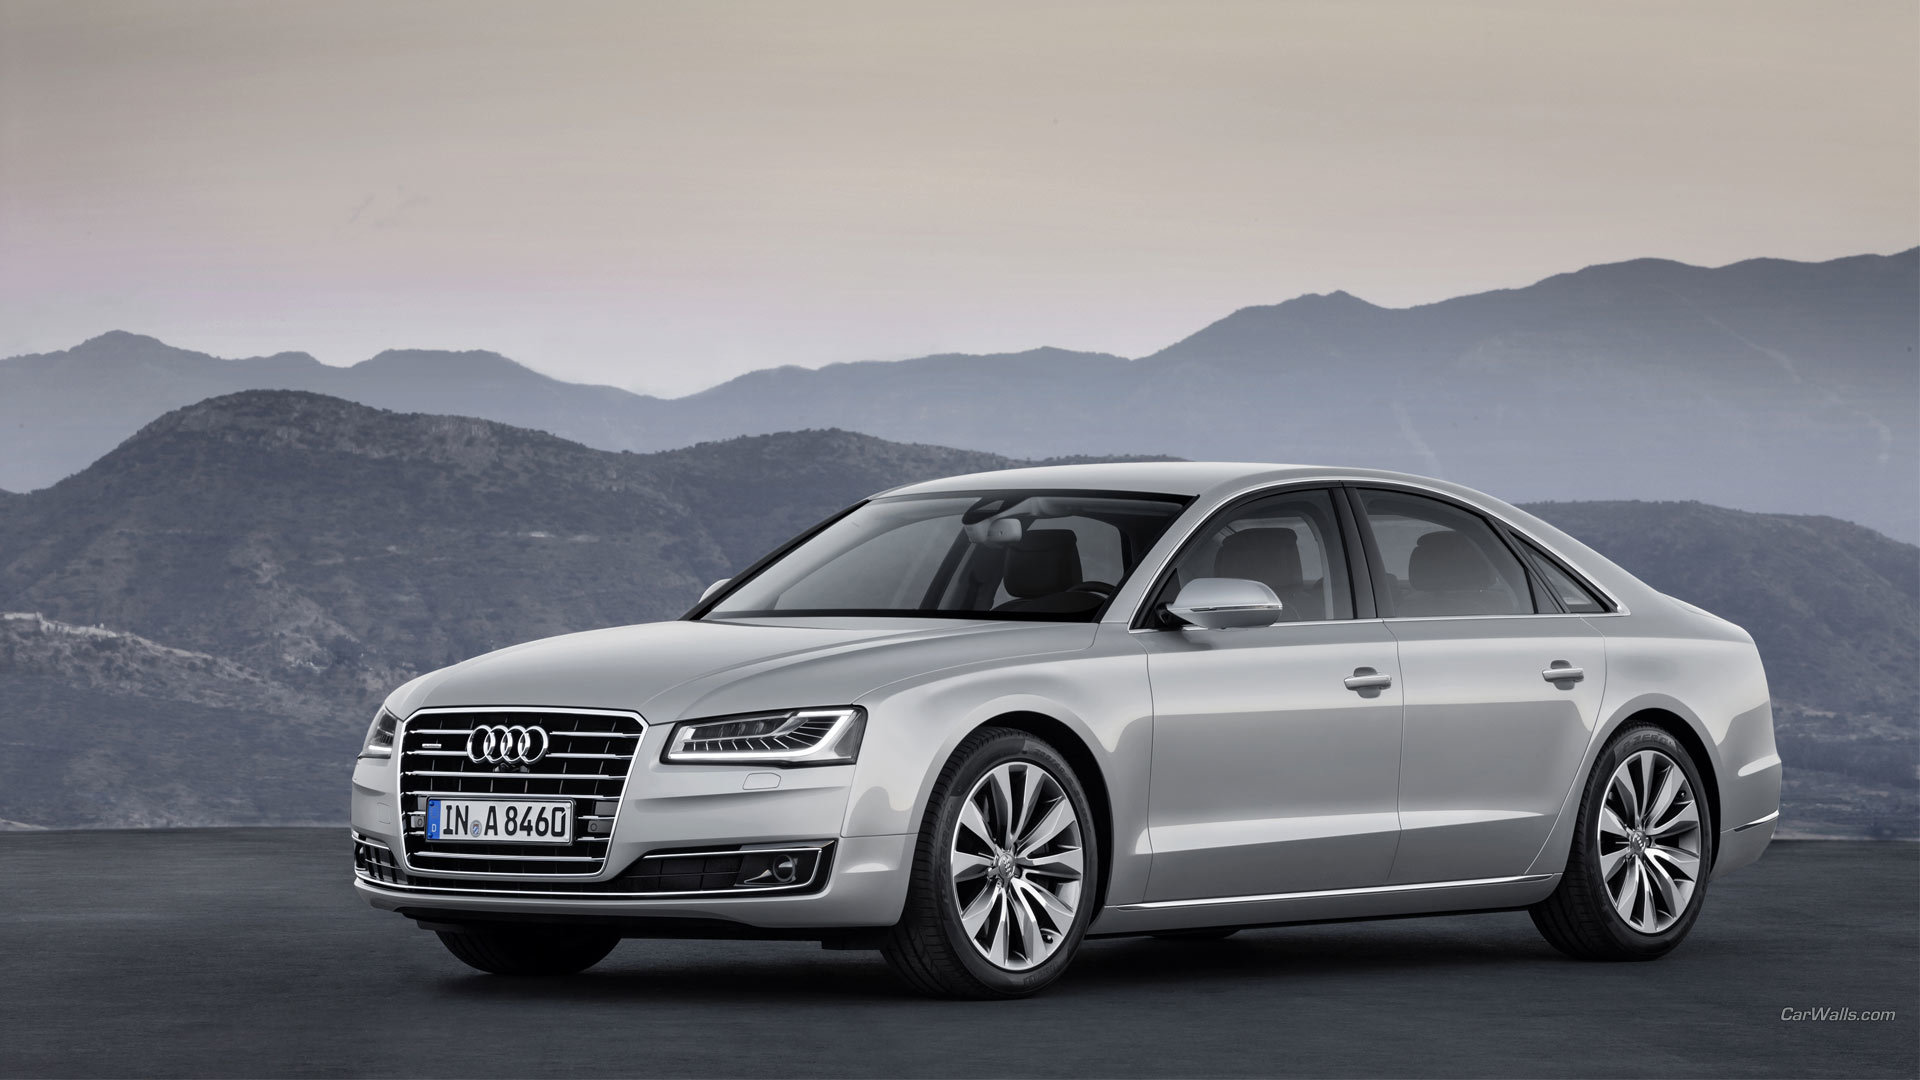 Audi A8 Wallpapers 1920x1080 Full Hd 1080p Desktop Backgrounds